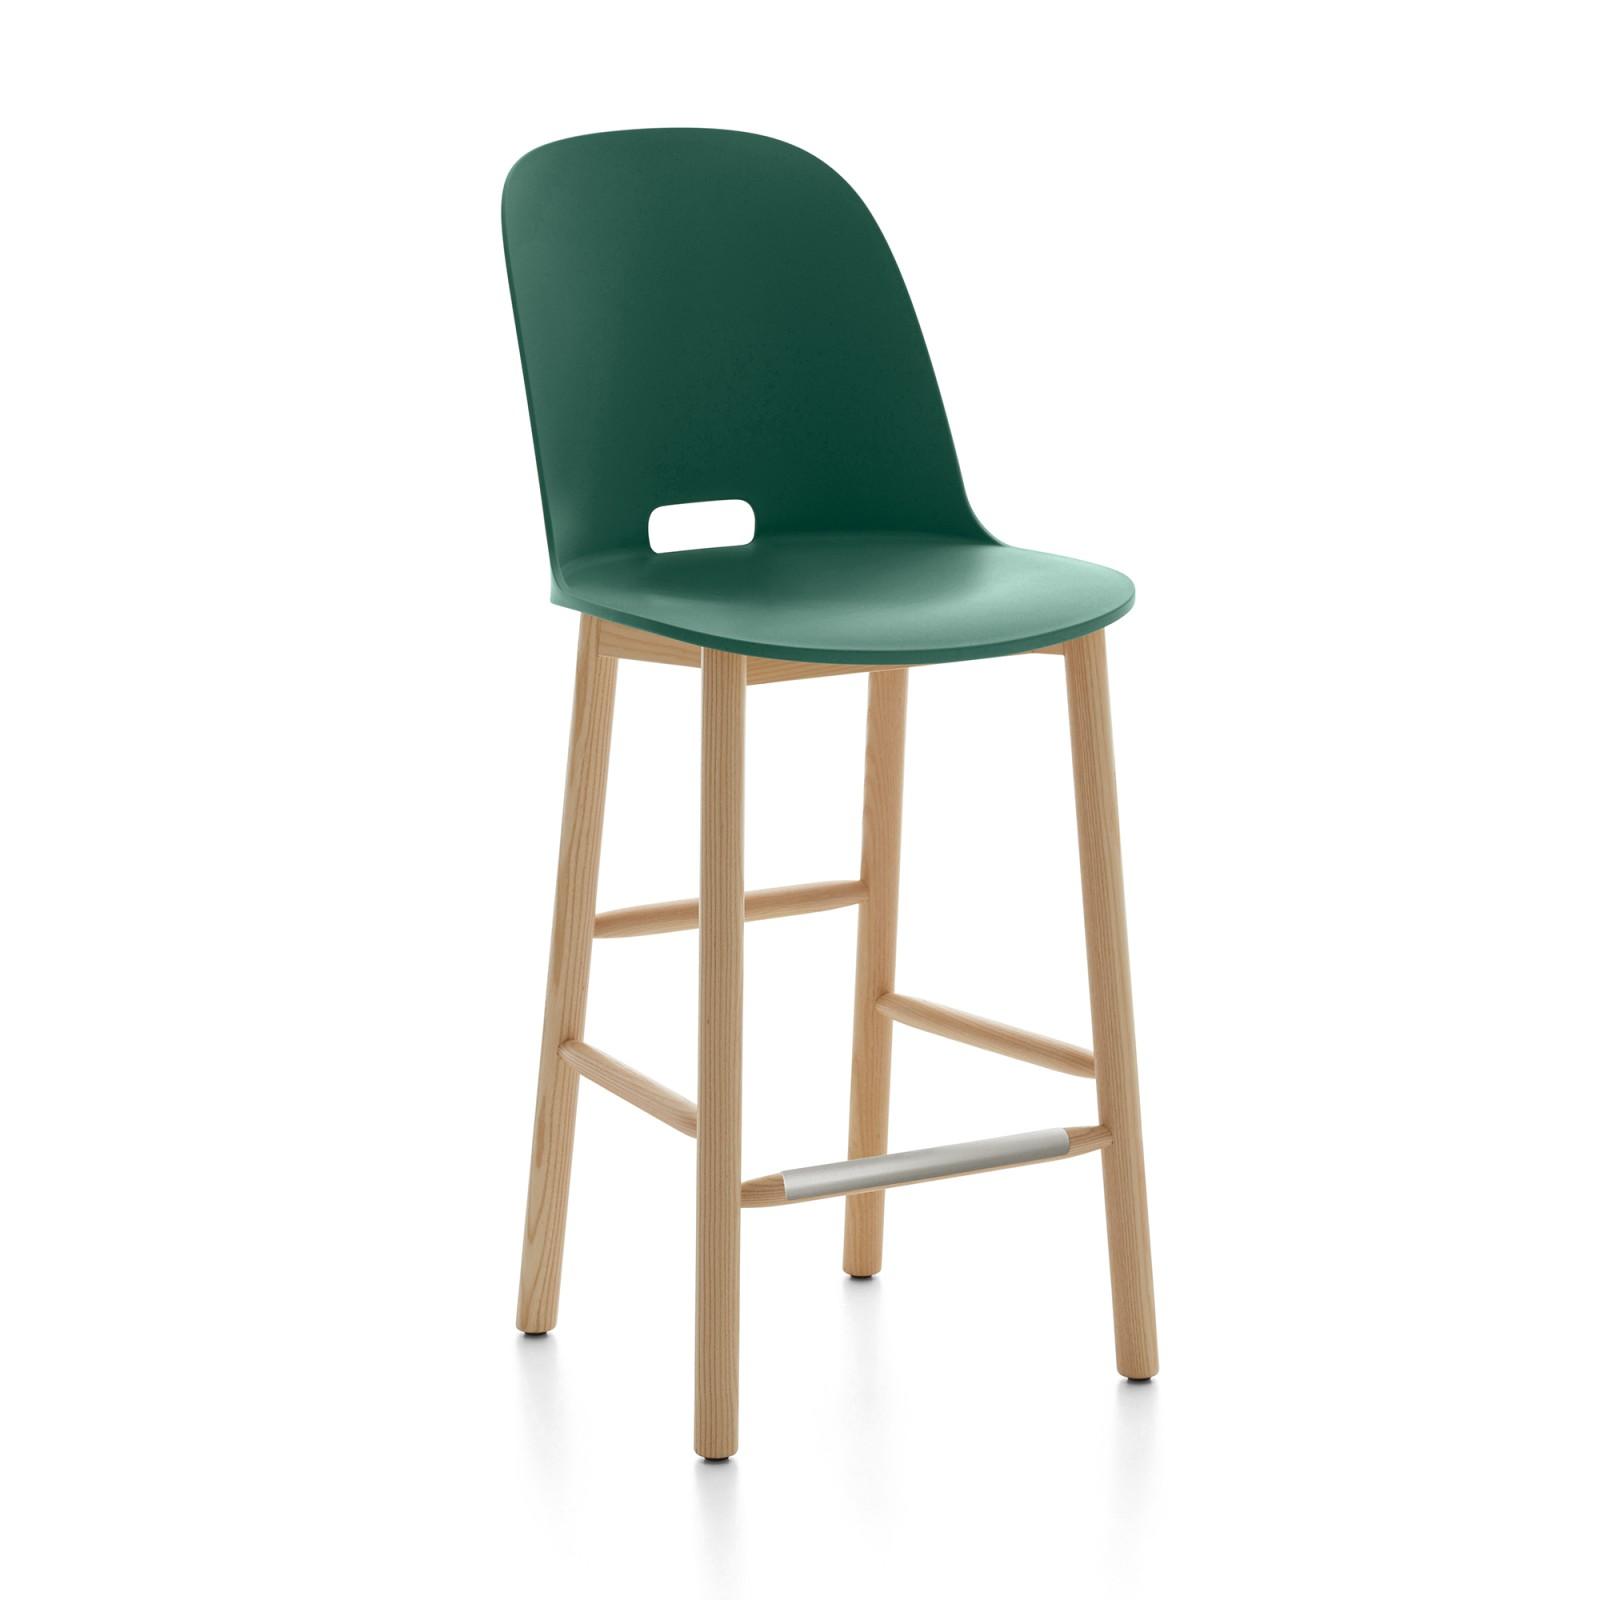 Alfi Counter Stool, High Back Green, Natural Light Ash Frame